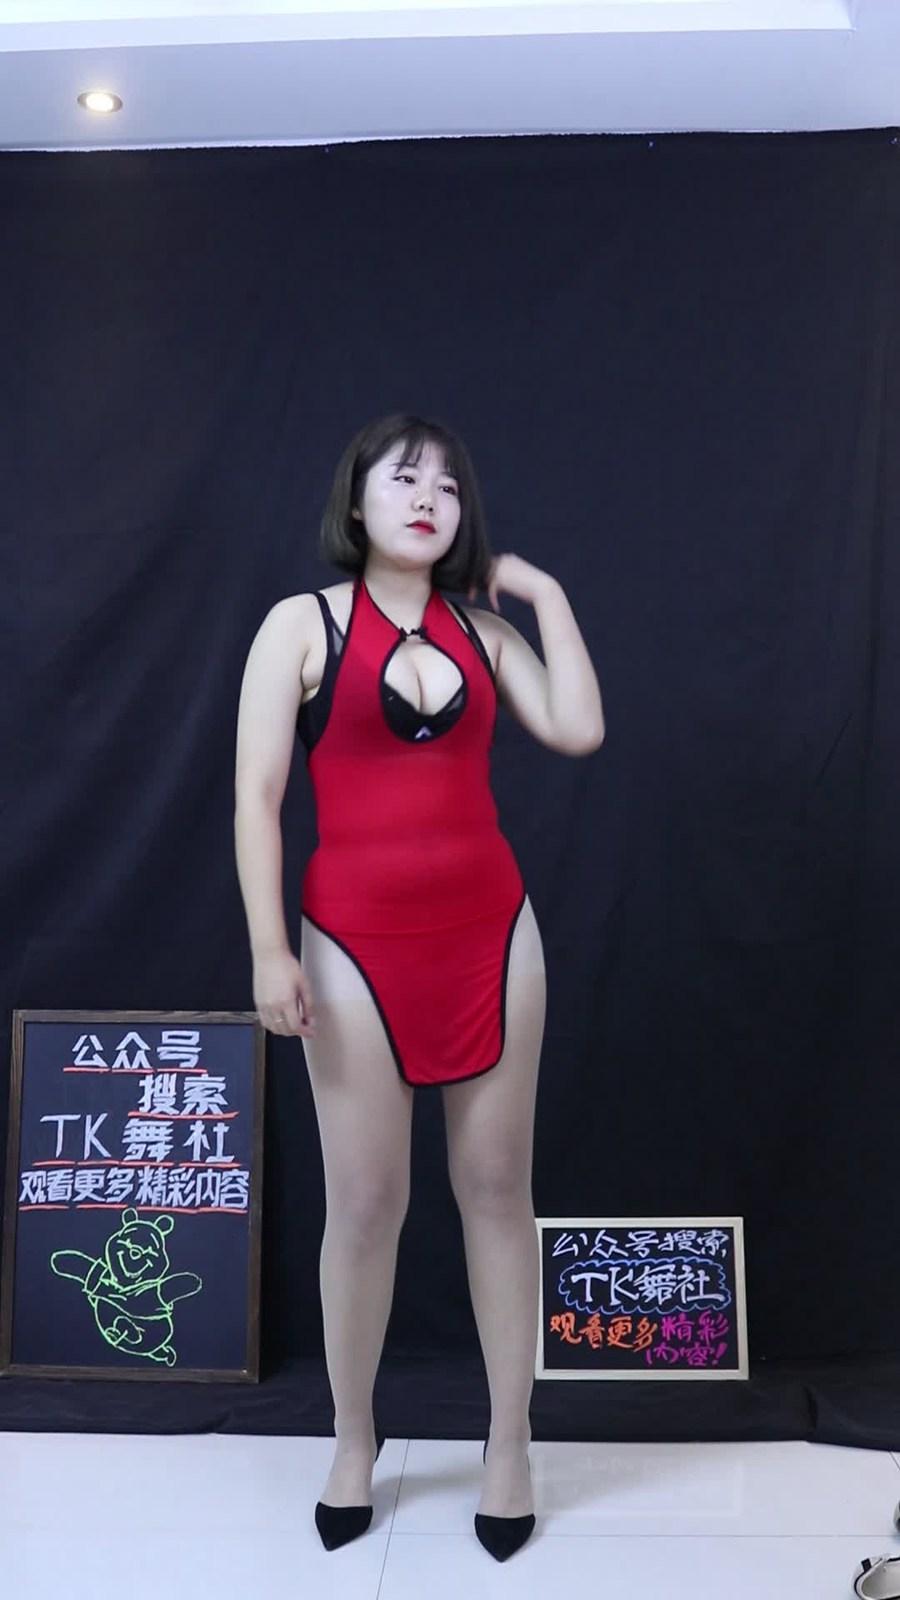 TK舞社 TK舞社 (80)